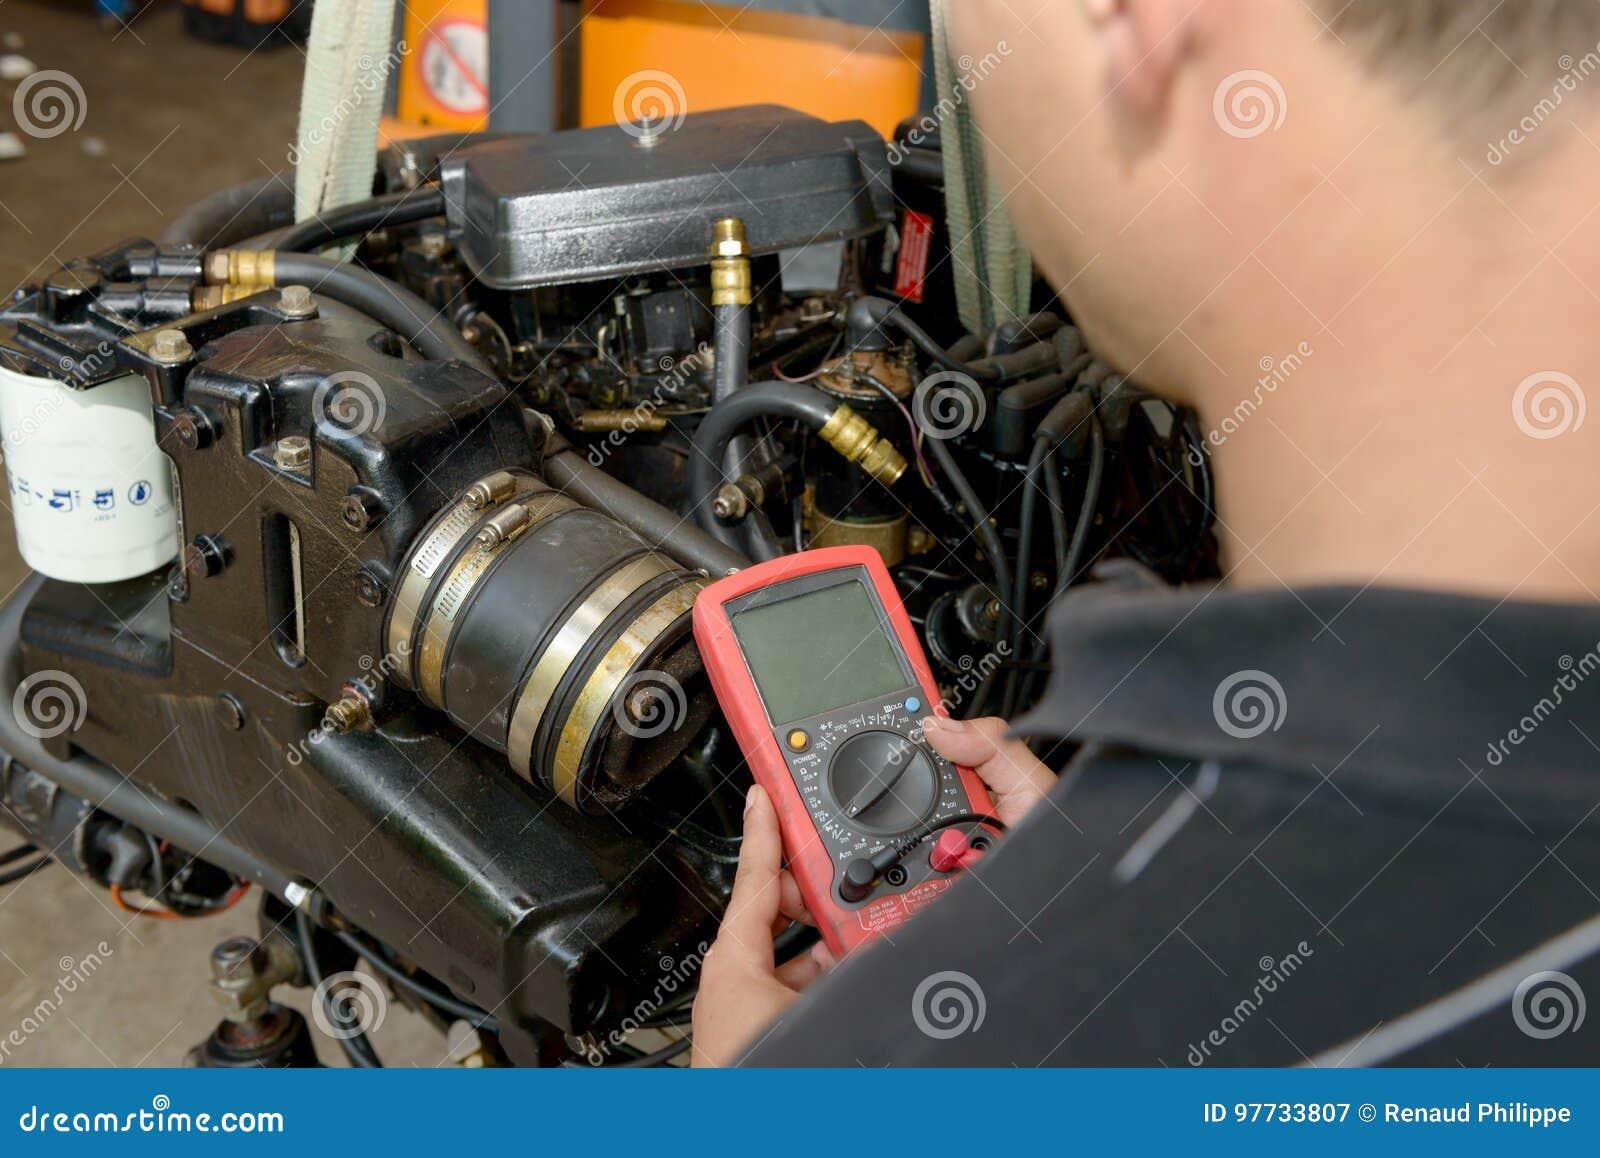 Automotive Digital Multimeter : Mechanic man with digital multimeter testing ignition coil stock